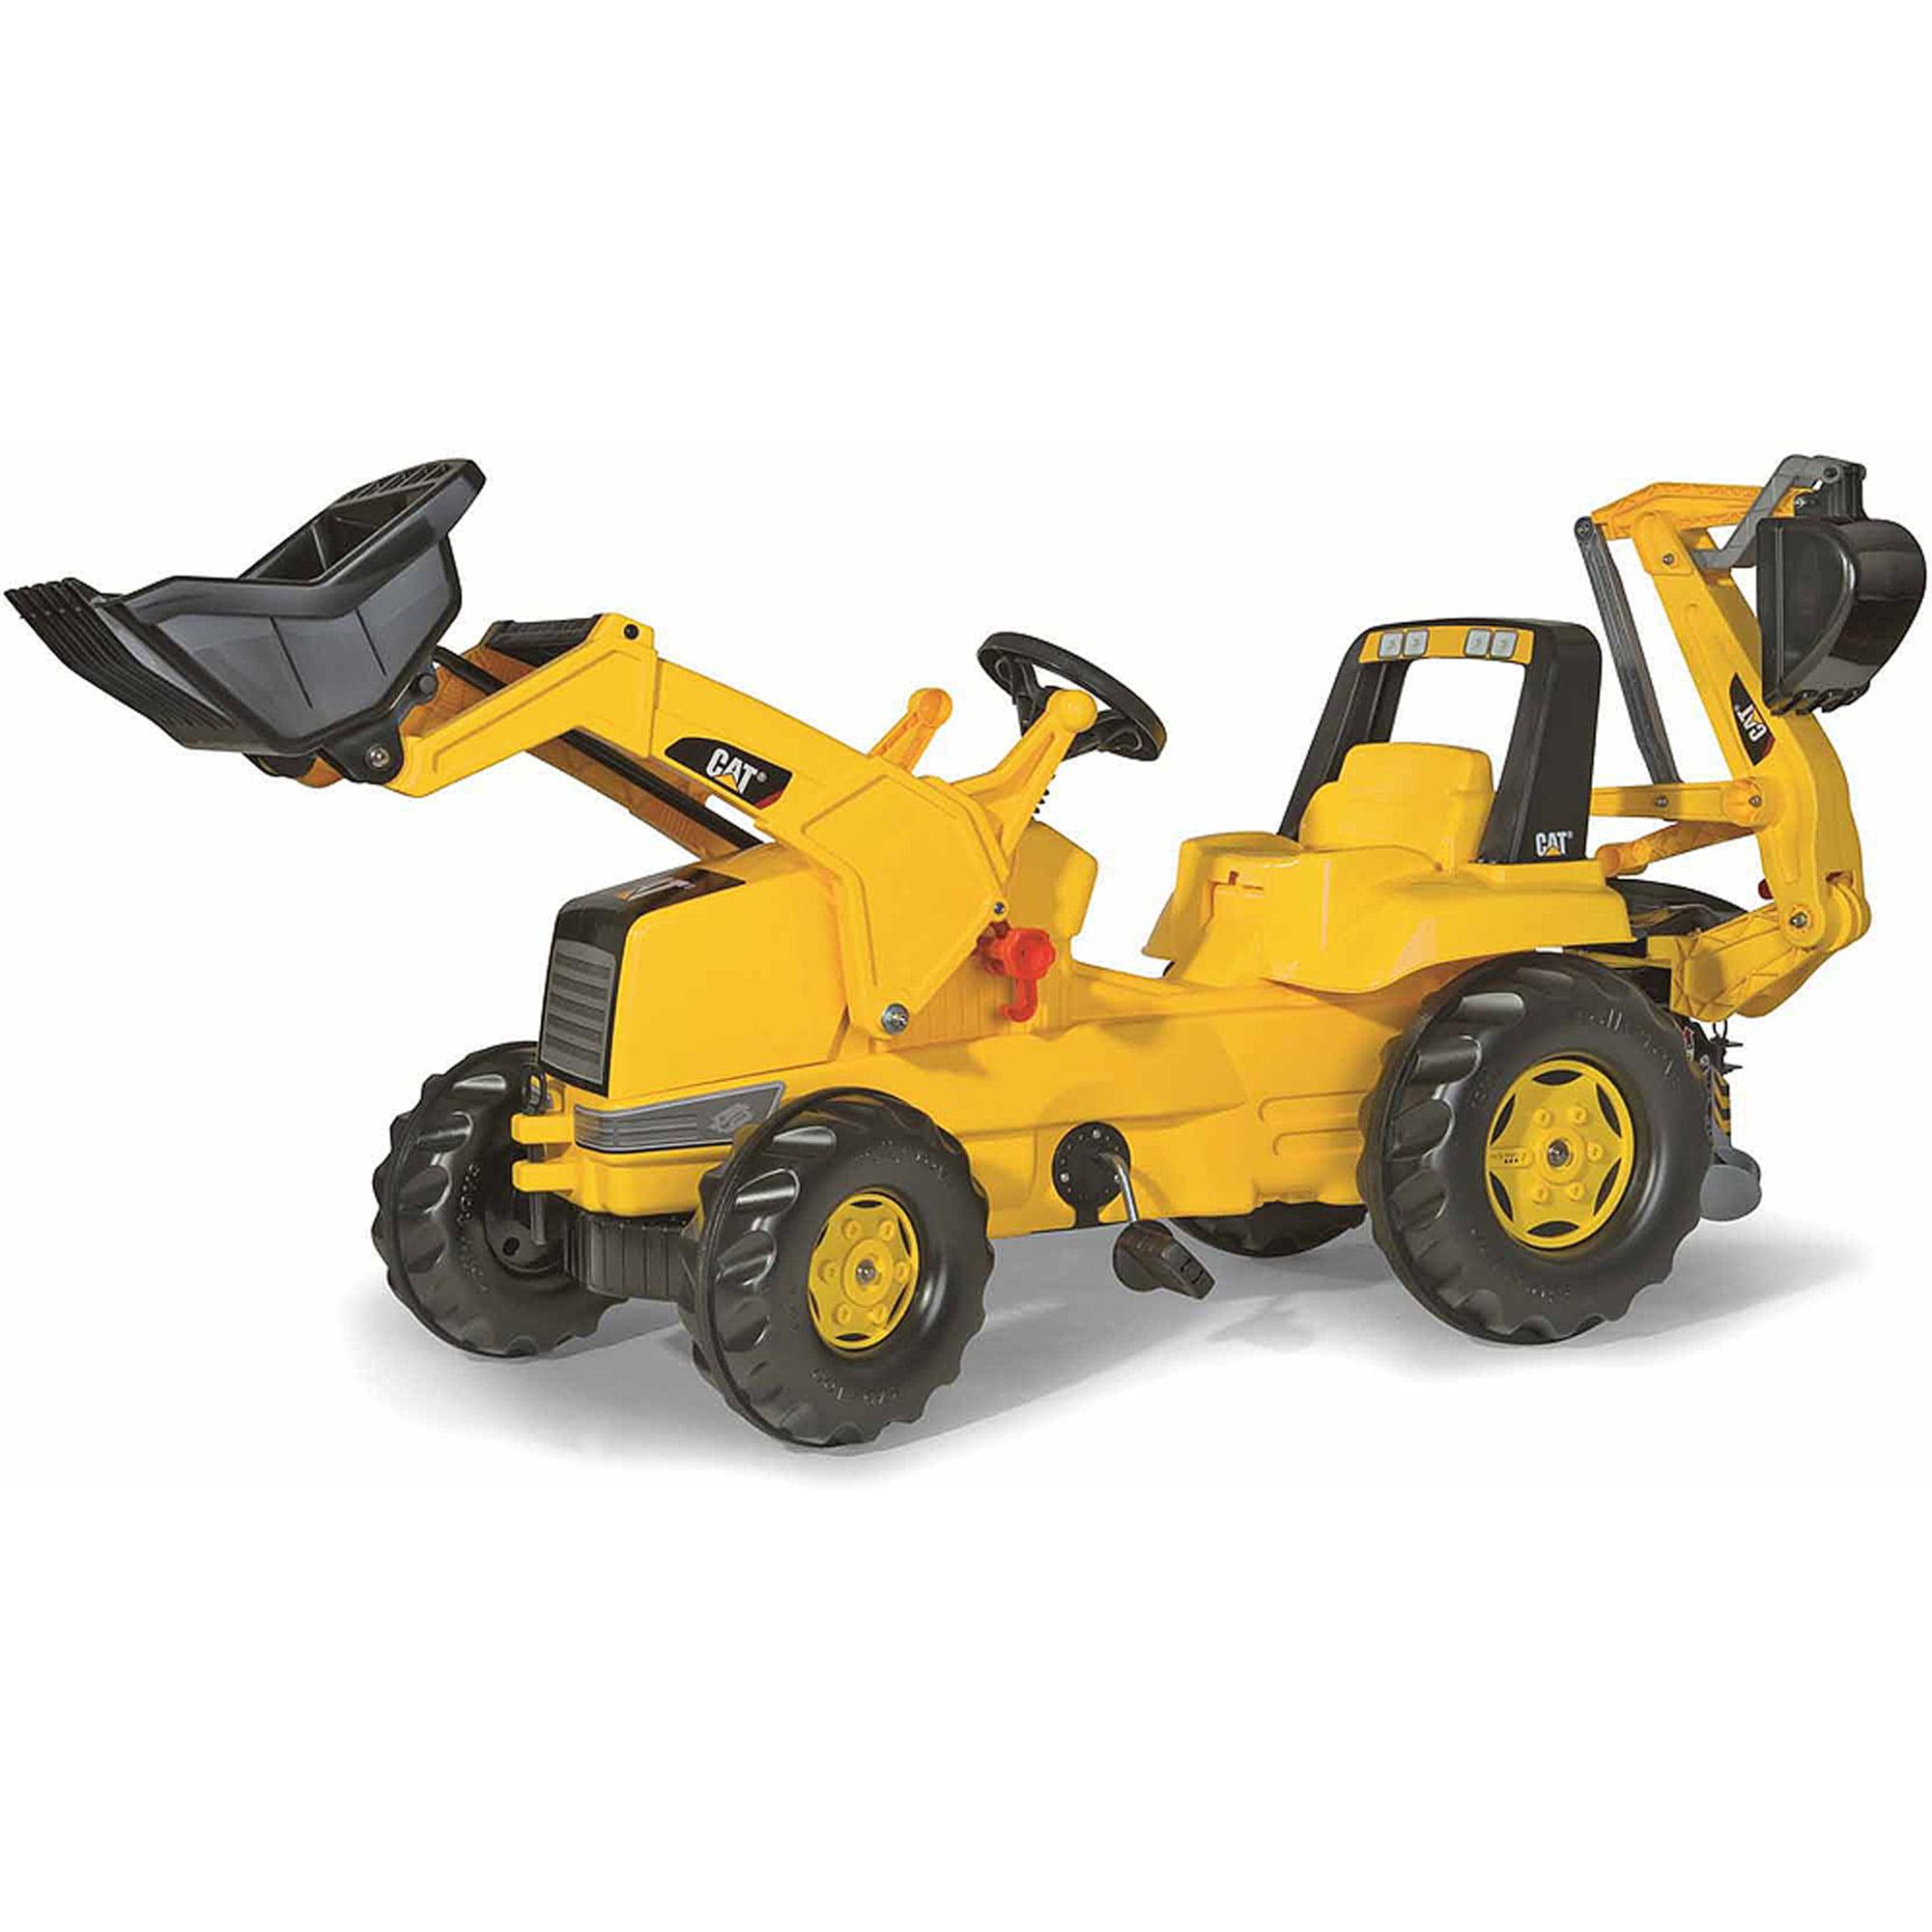 Rolly CAT Backhoe Loader Tractor